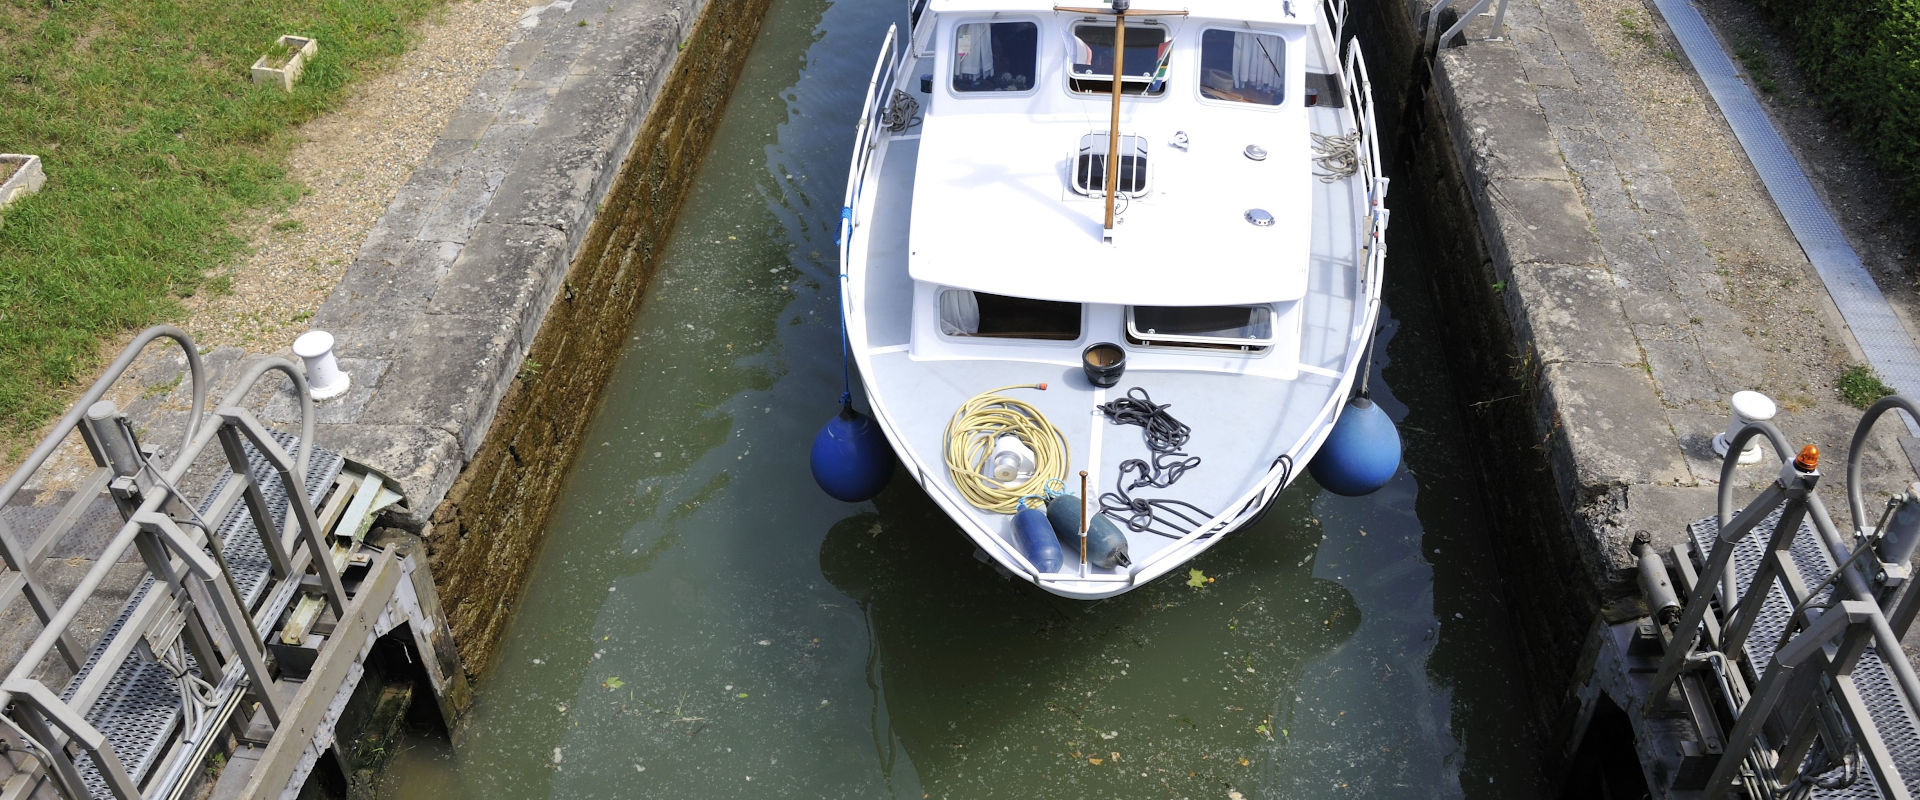 Balade au fil de l'eau en Val de Garonne Guyenne Gascogne